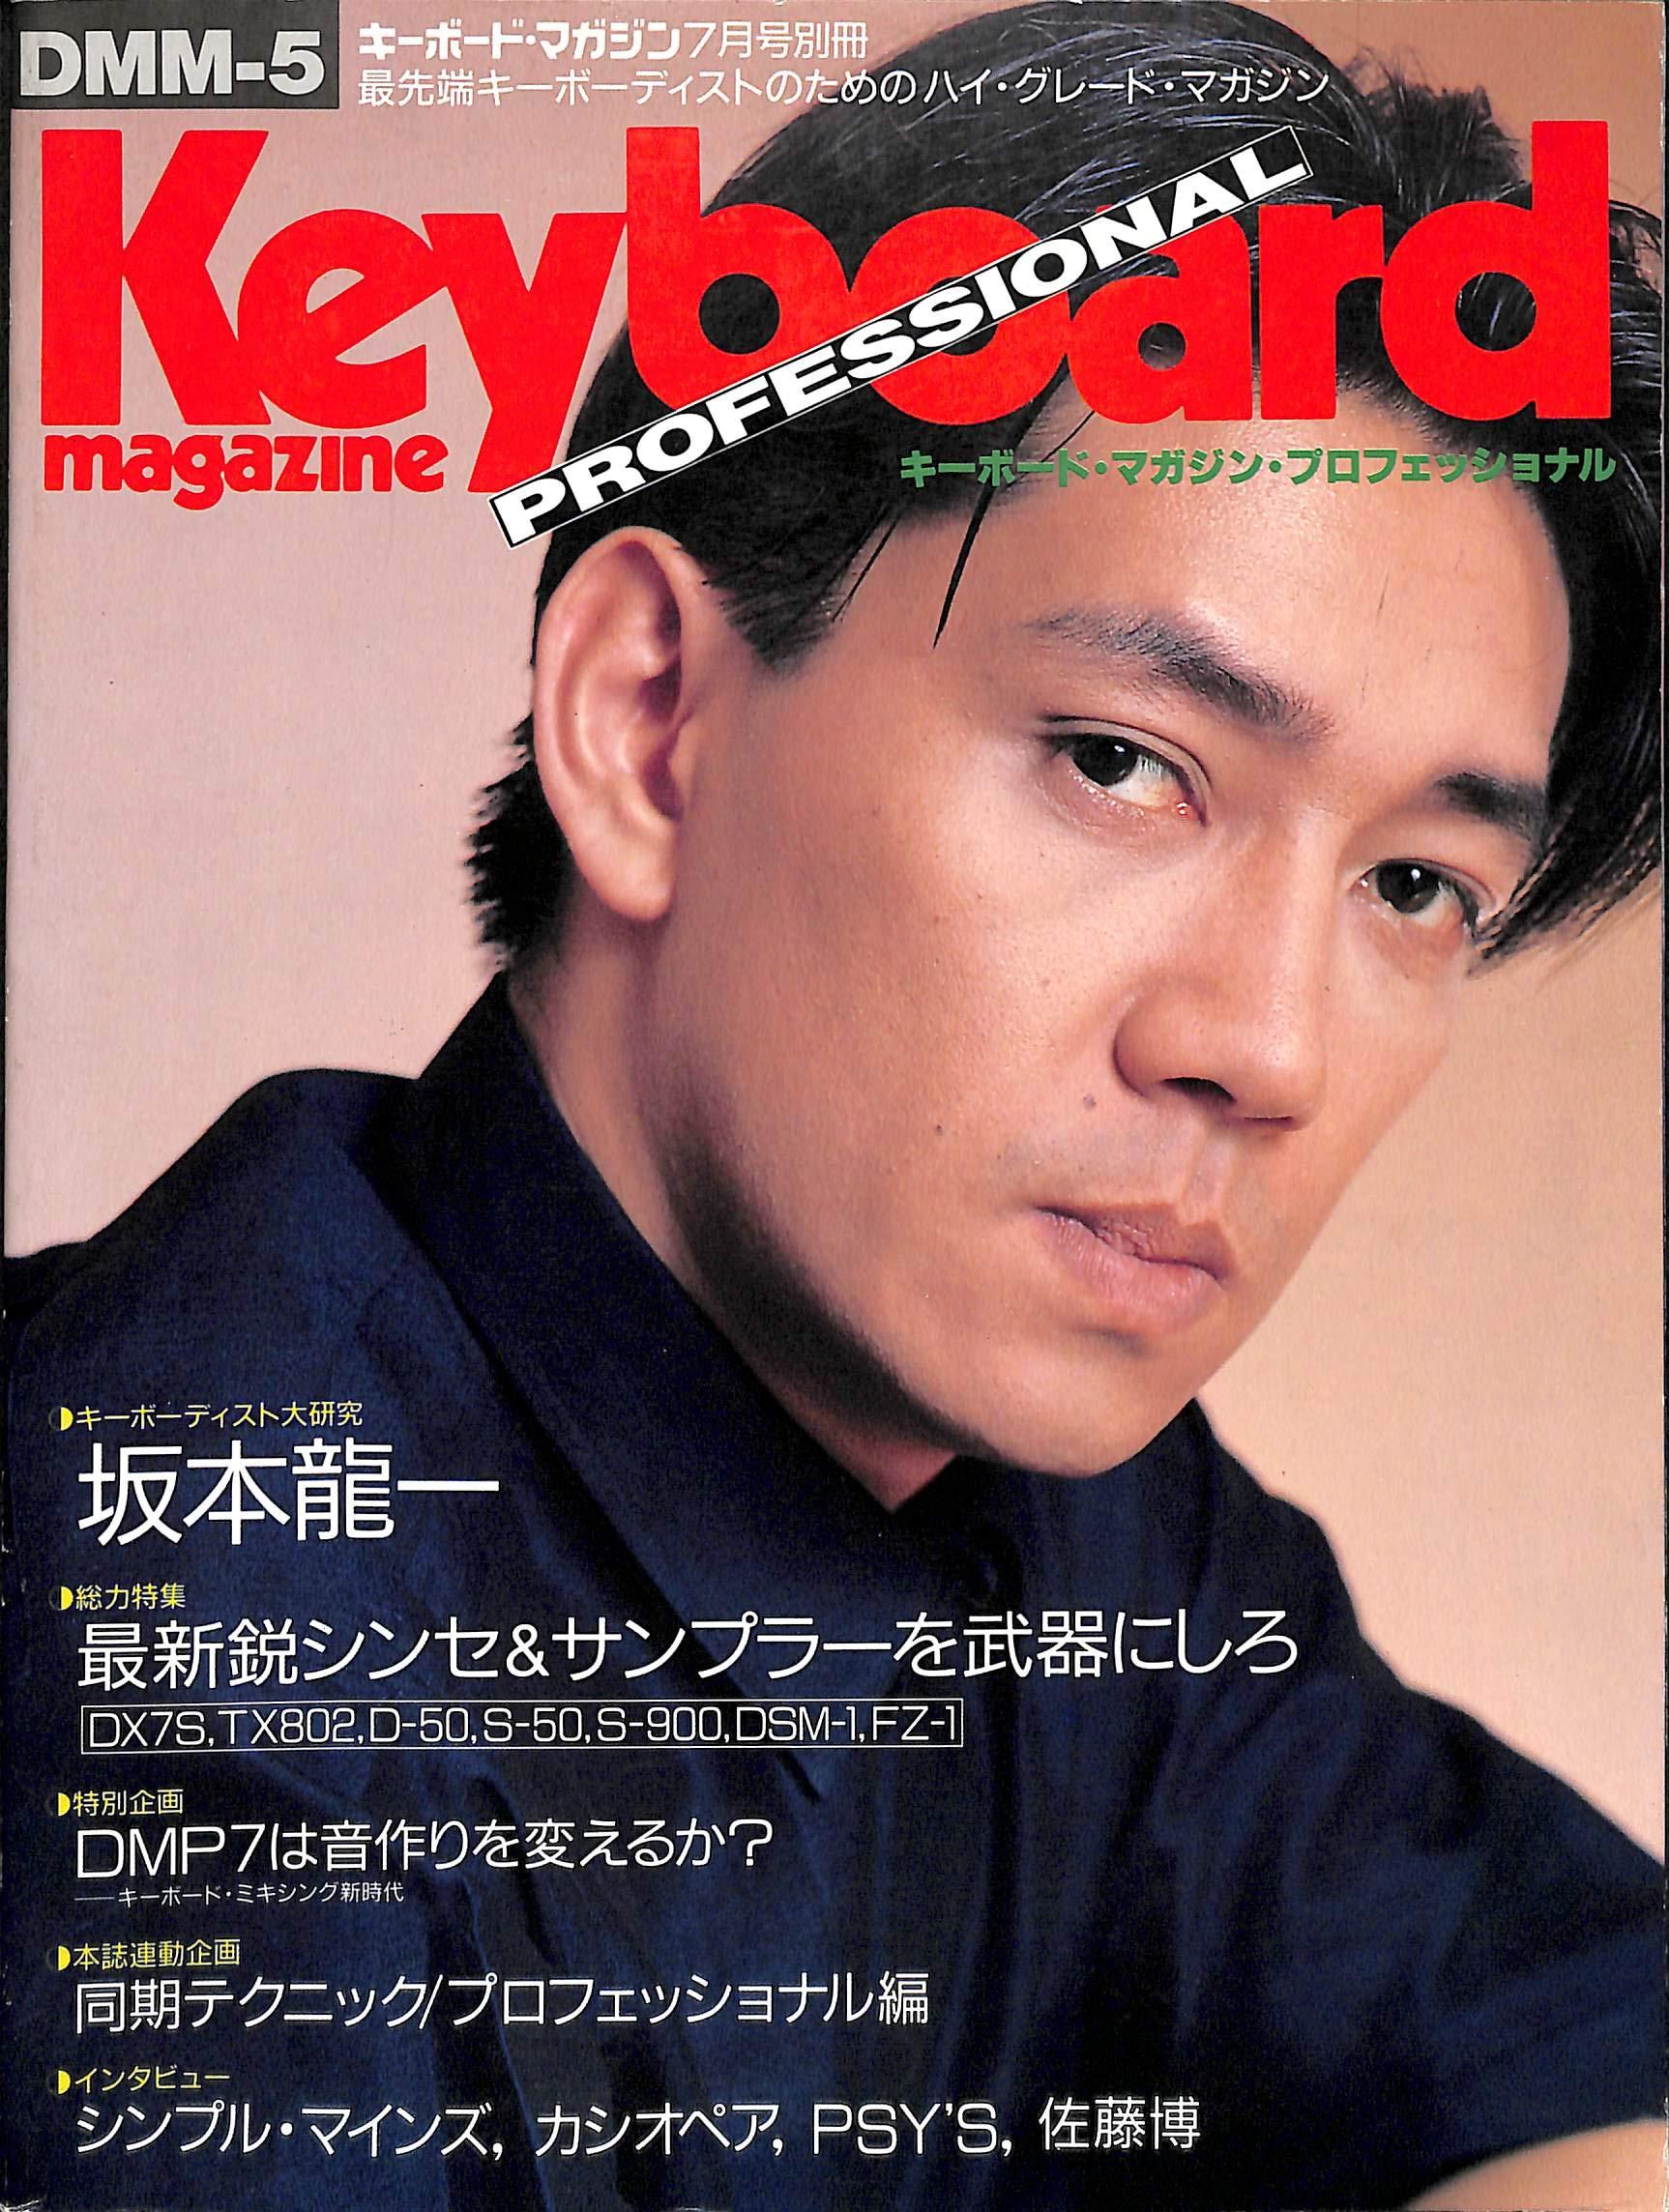 https://www.amazon.co.jp/images/I/812aobJ2liL.jpg